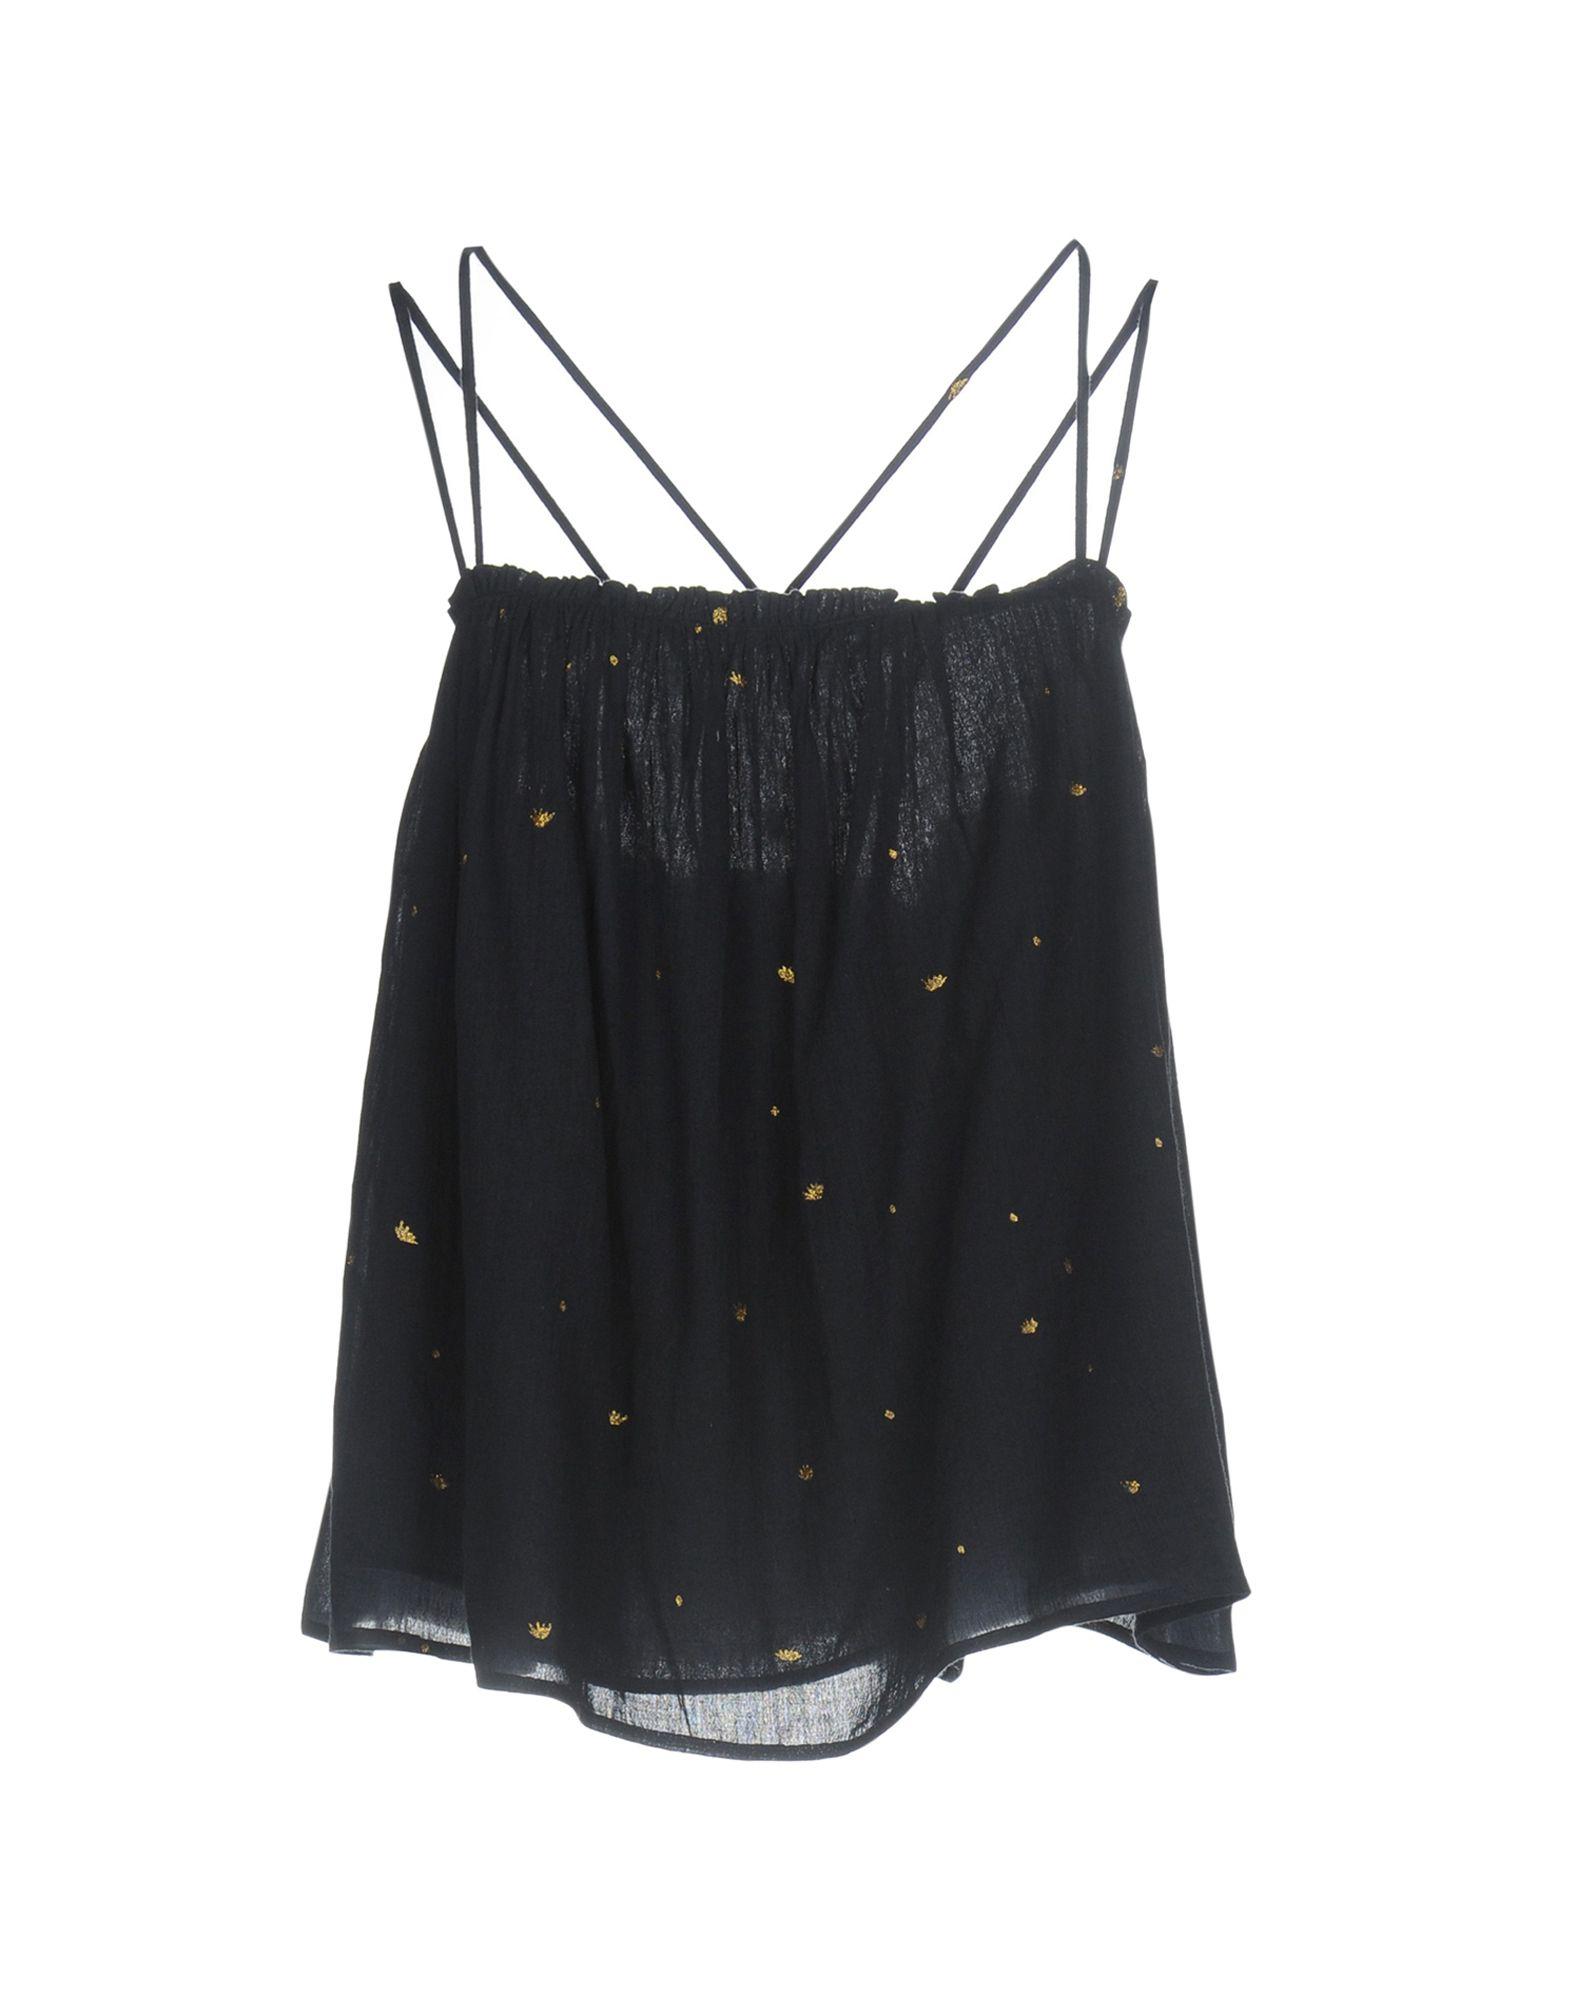 des petits hauts короткое платье DES PETITS HAUTS Топ без рукавов